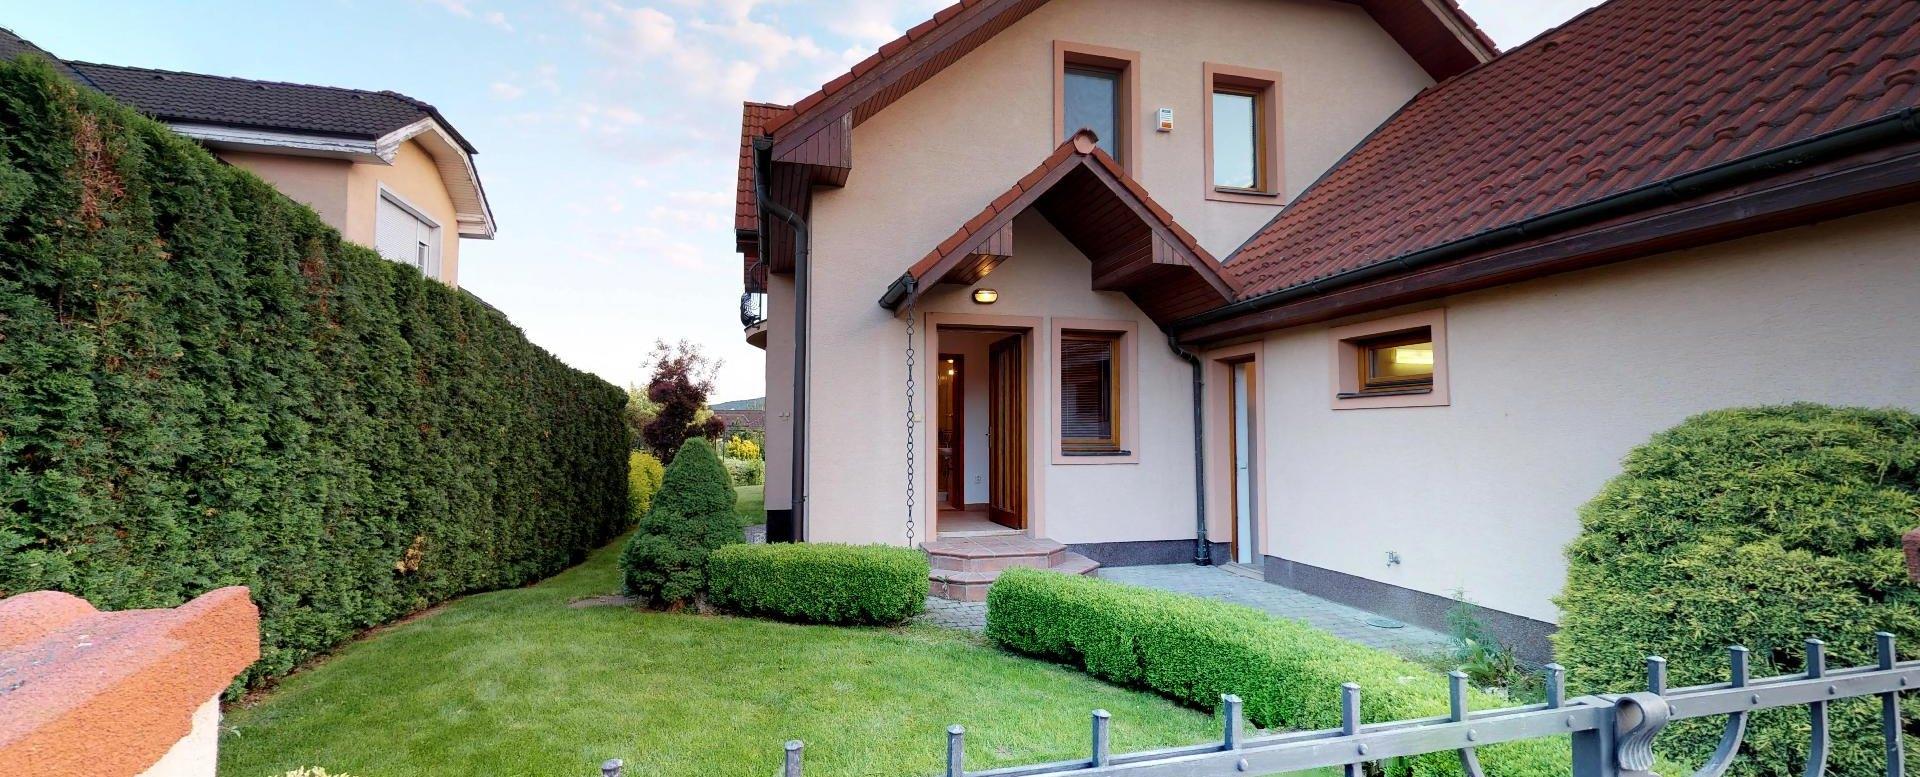 Pohľad na dom z ulice